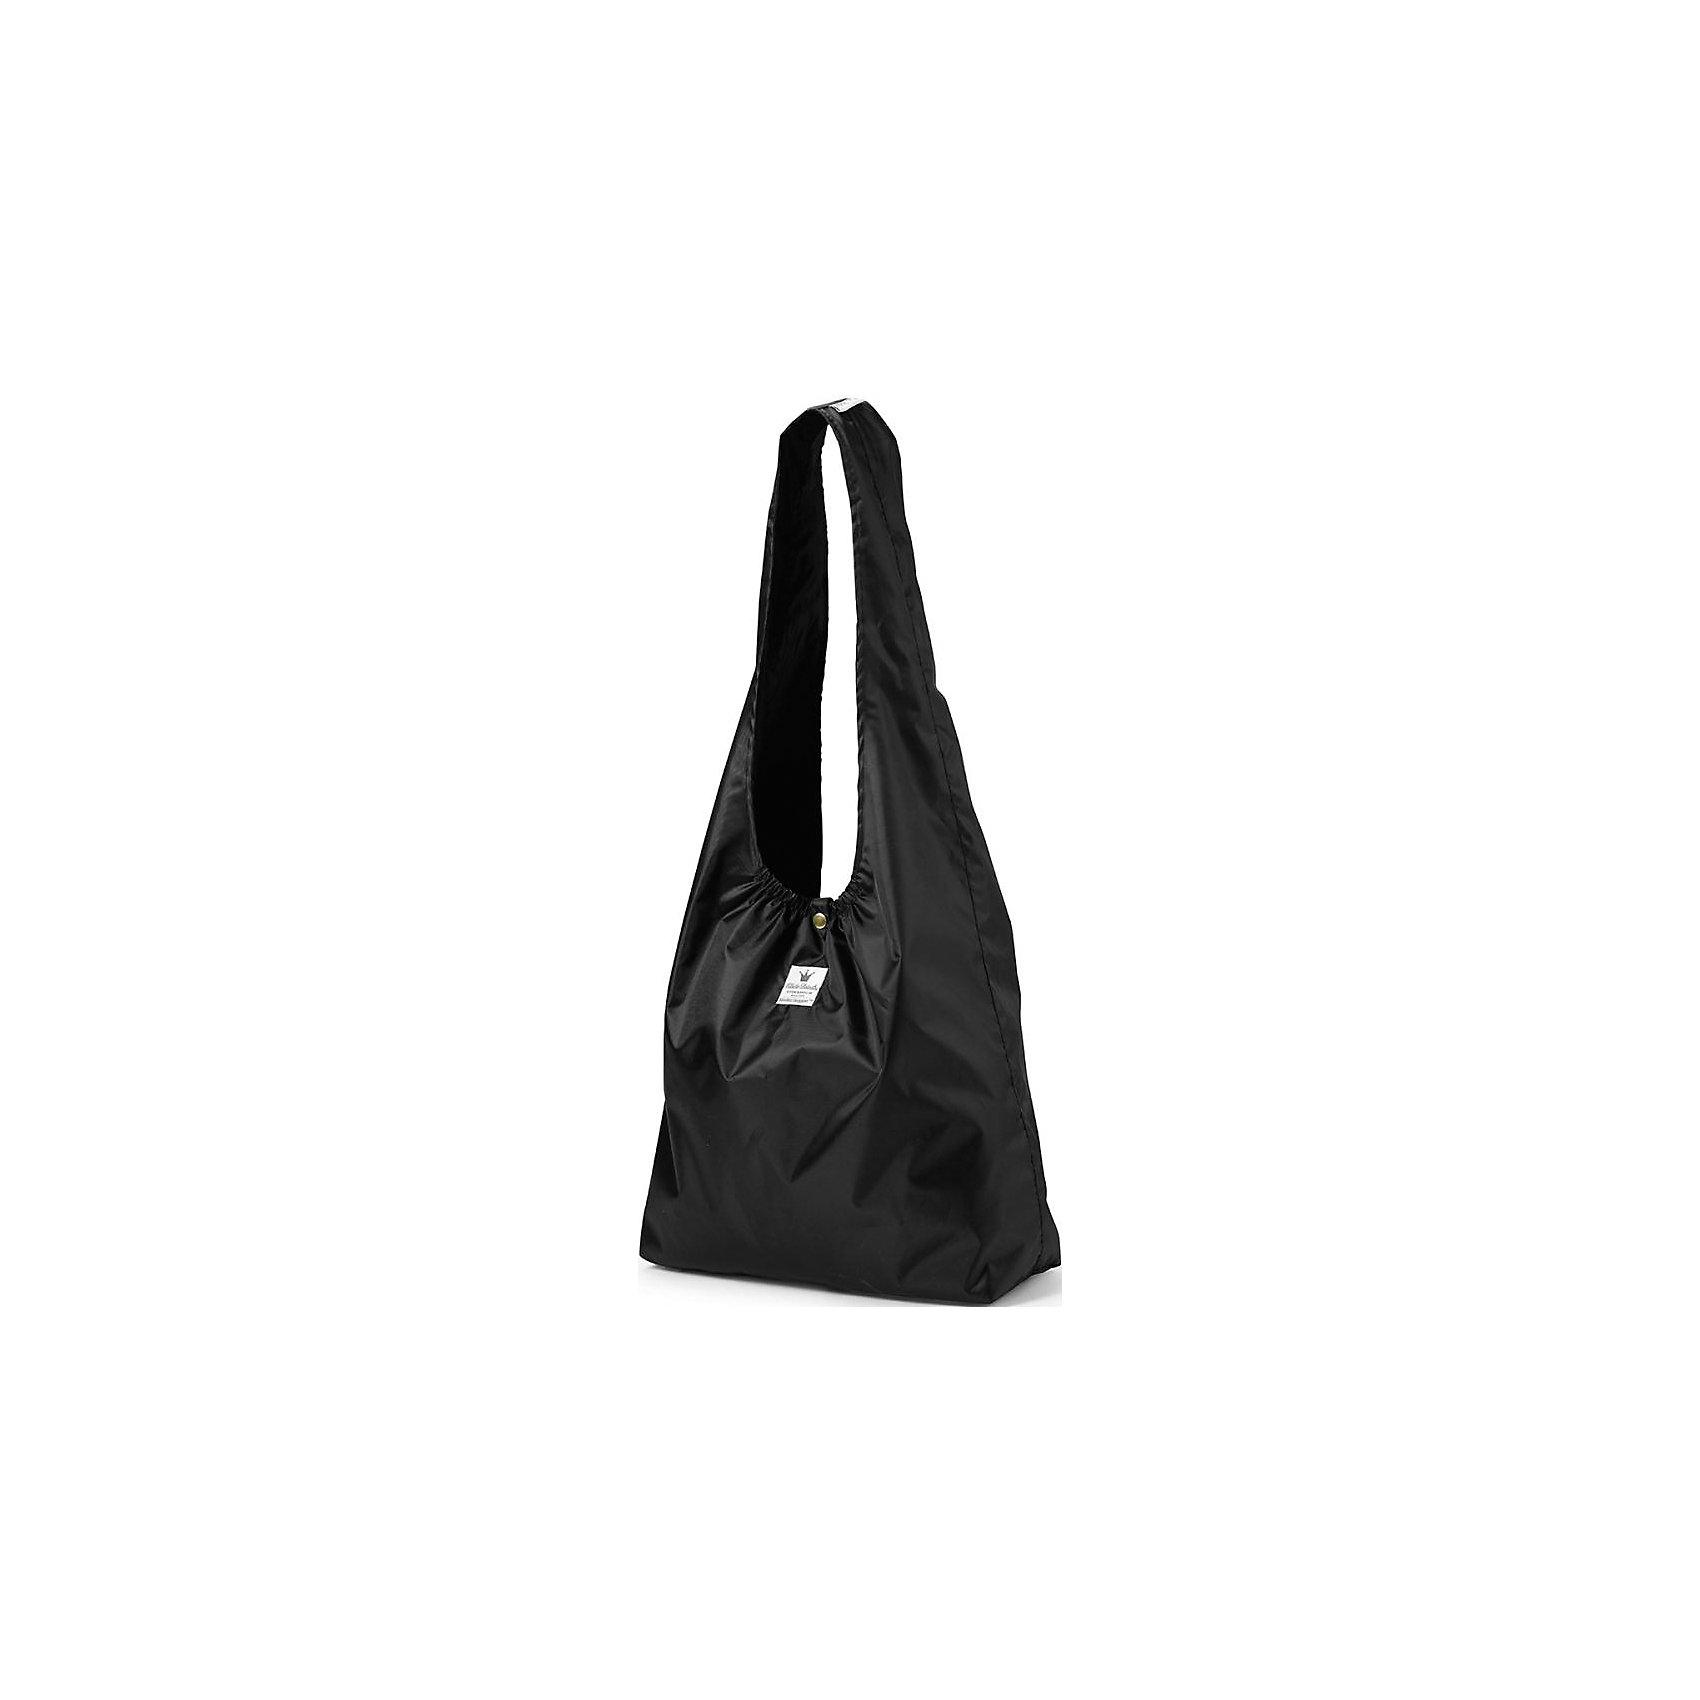 Сумка Black Edition Stroller Shopper, Elodie Details